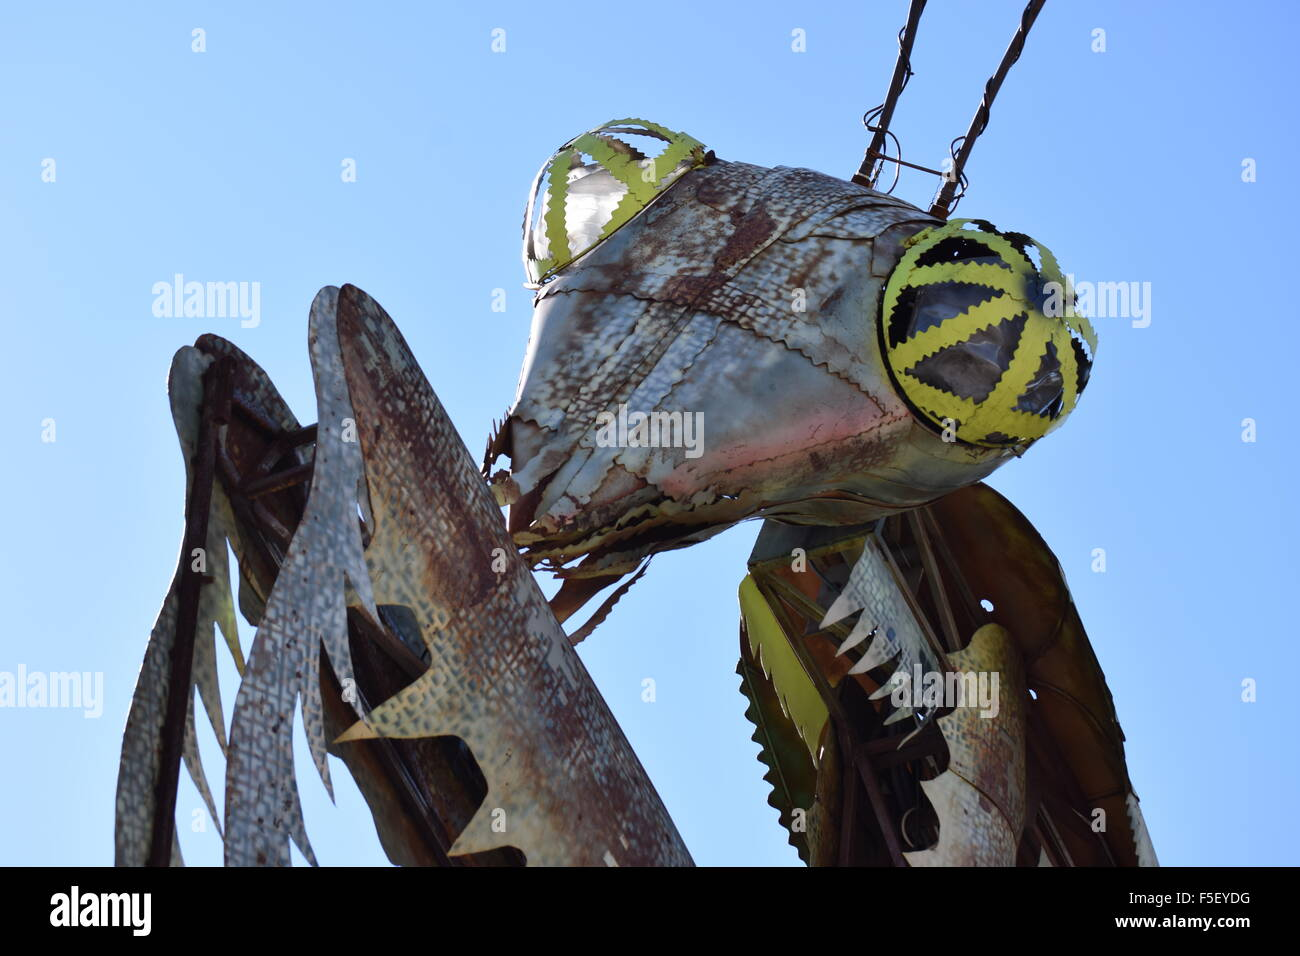 Preying Mantis Mascot. - Stock Image